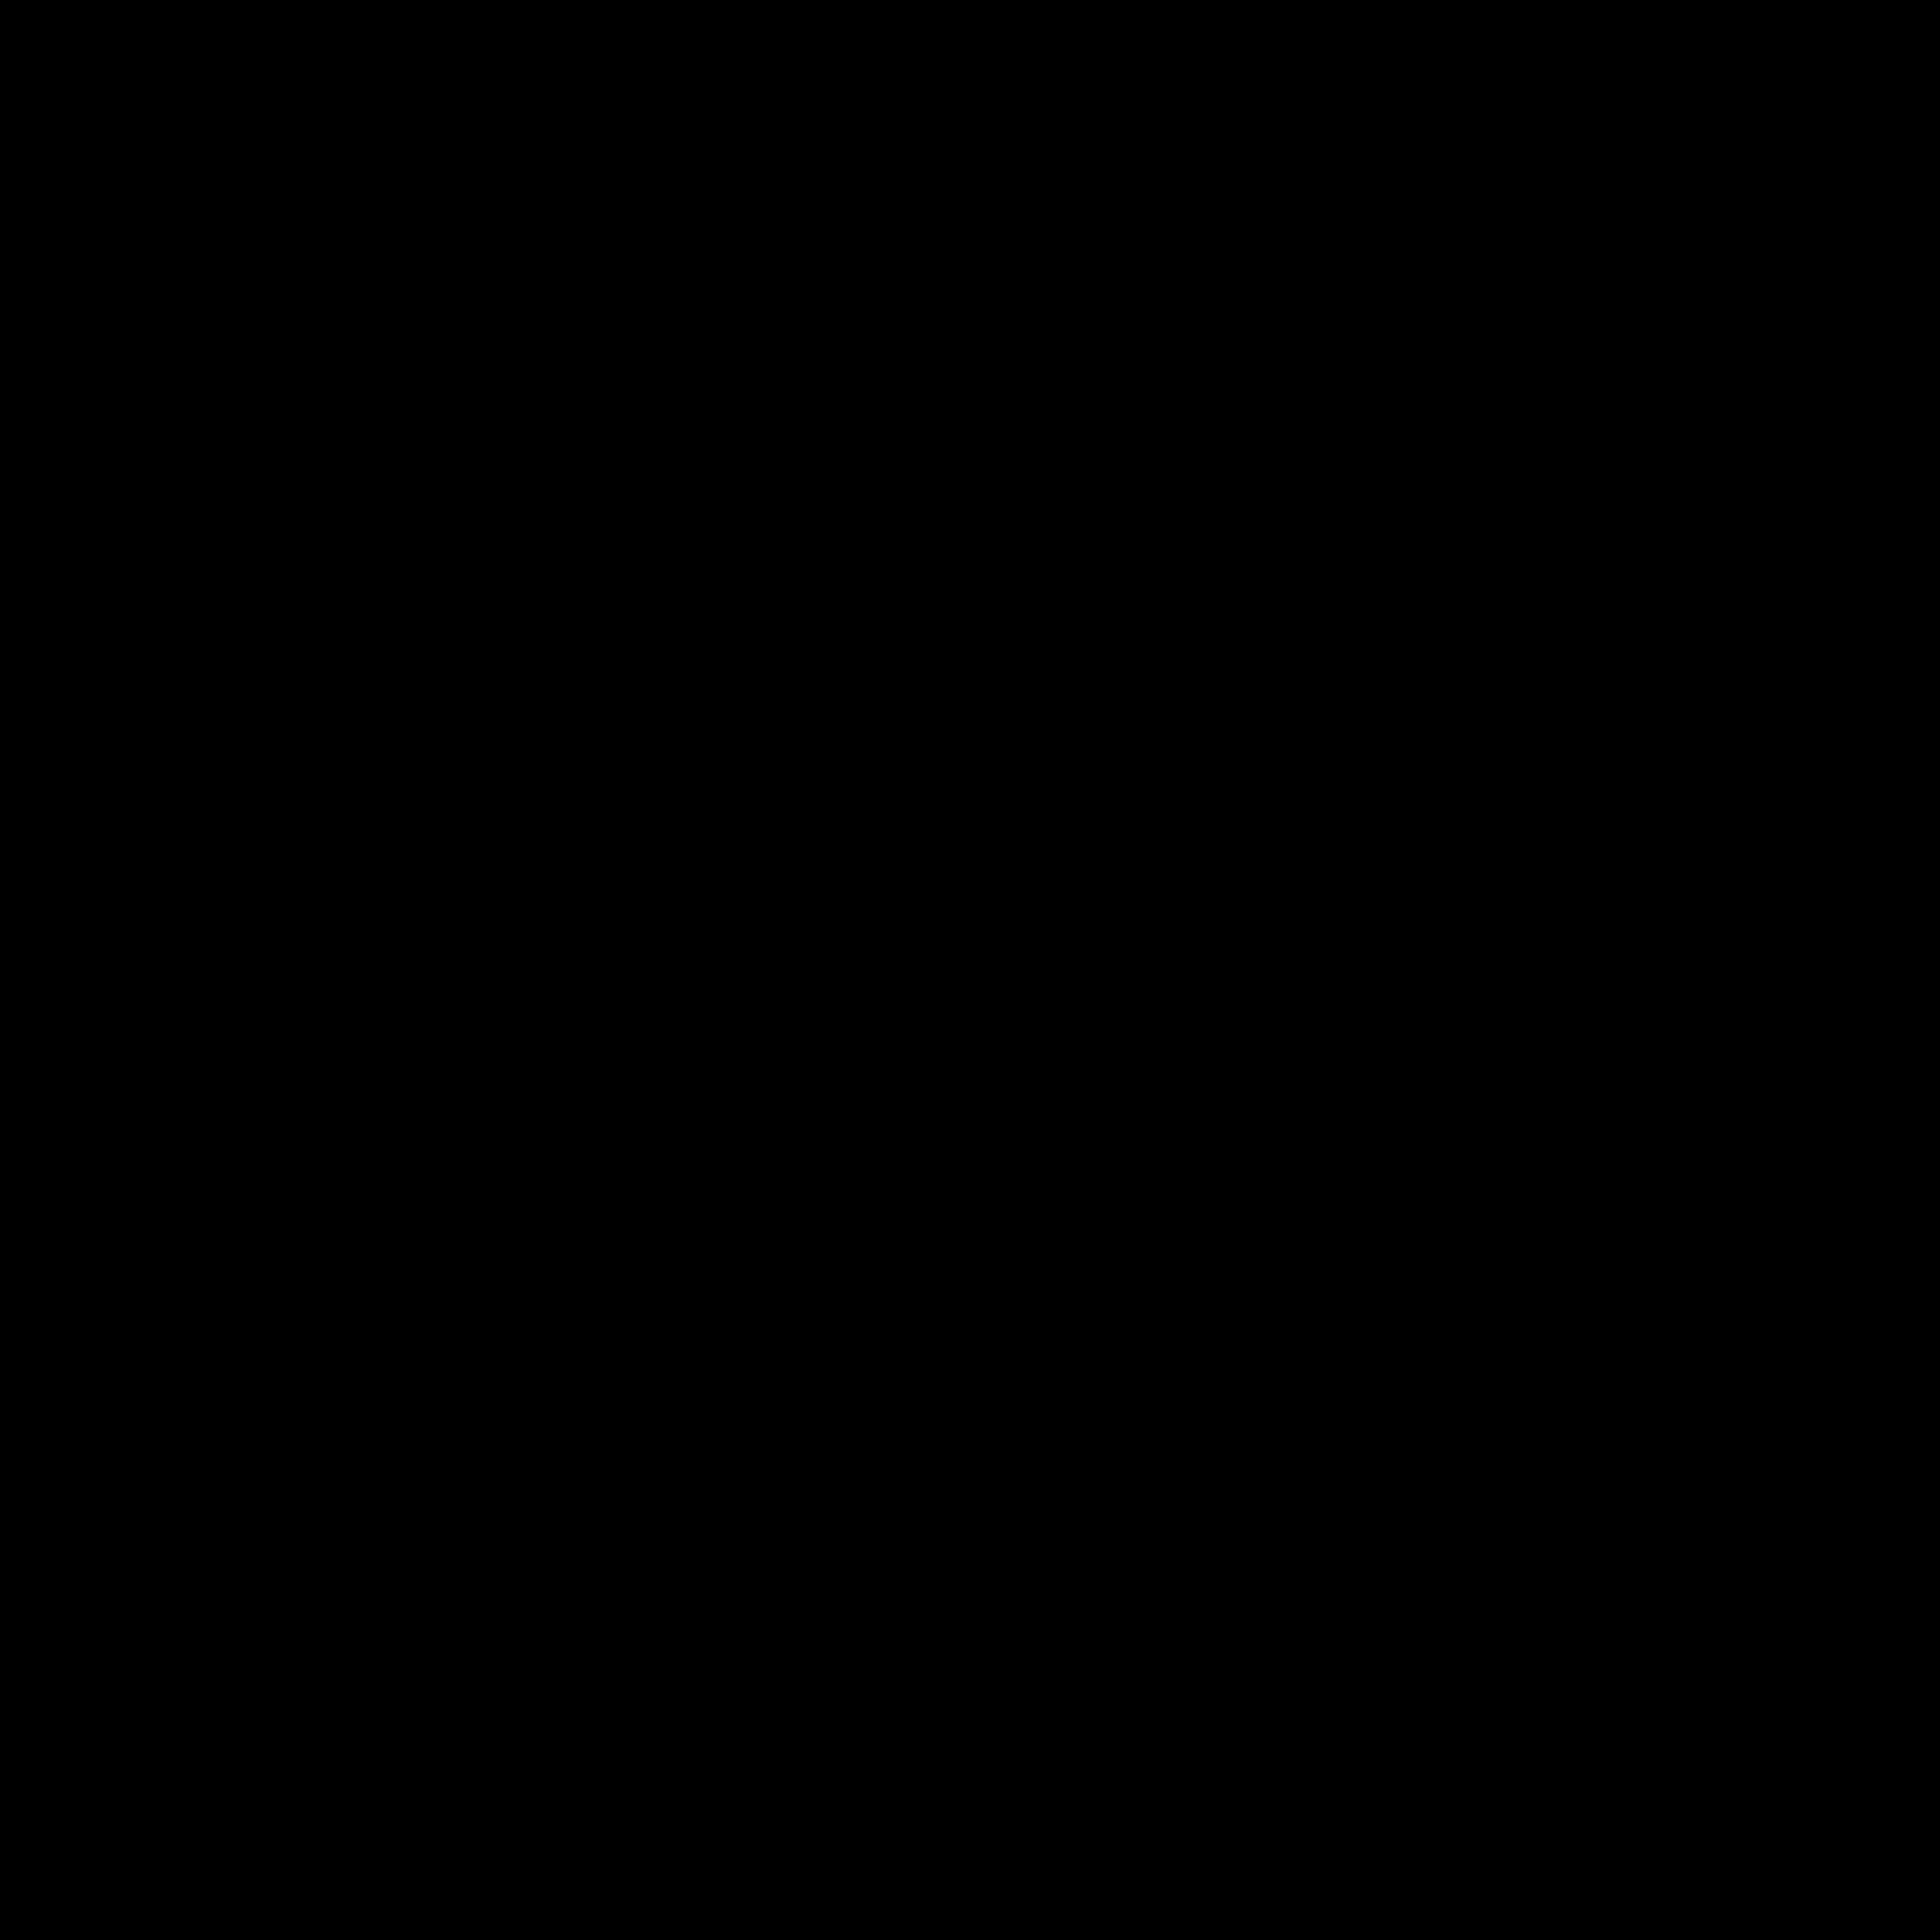 Bvlgari Logo PNG Transparent & SVG Vector.